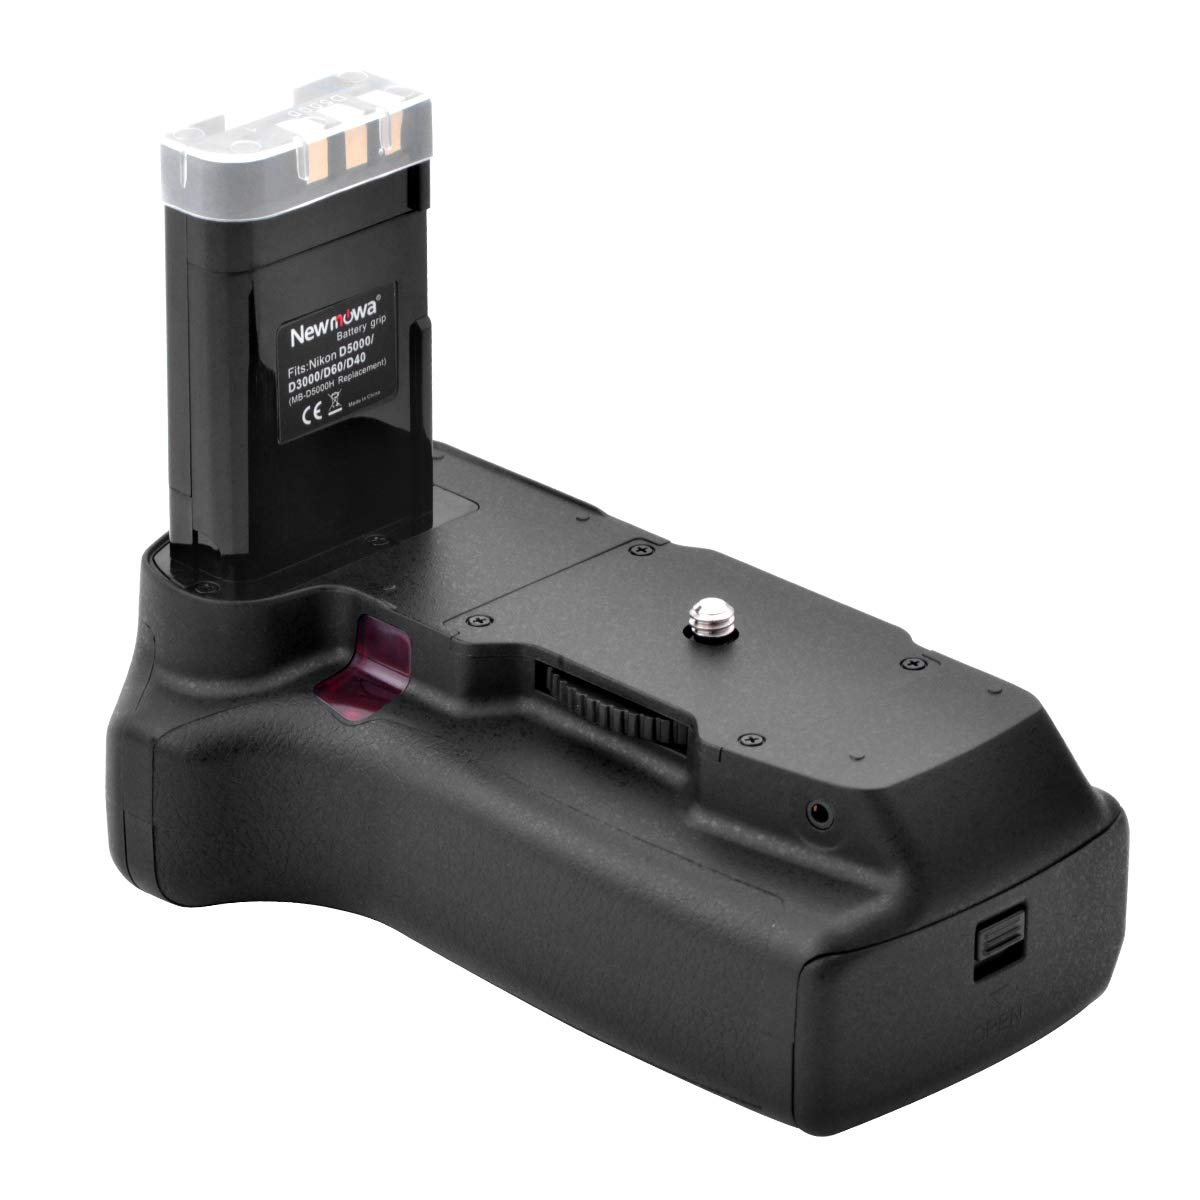 Newmowa MB-D5000H Mango de Repuesto Battery Grip para Nikon D40 ...